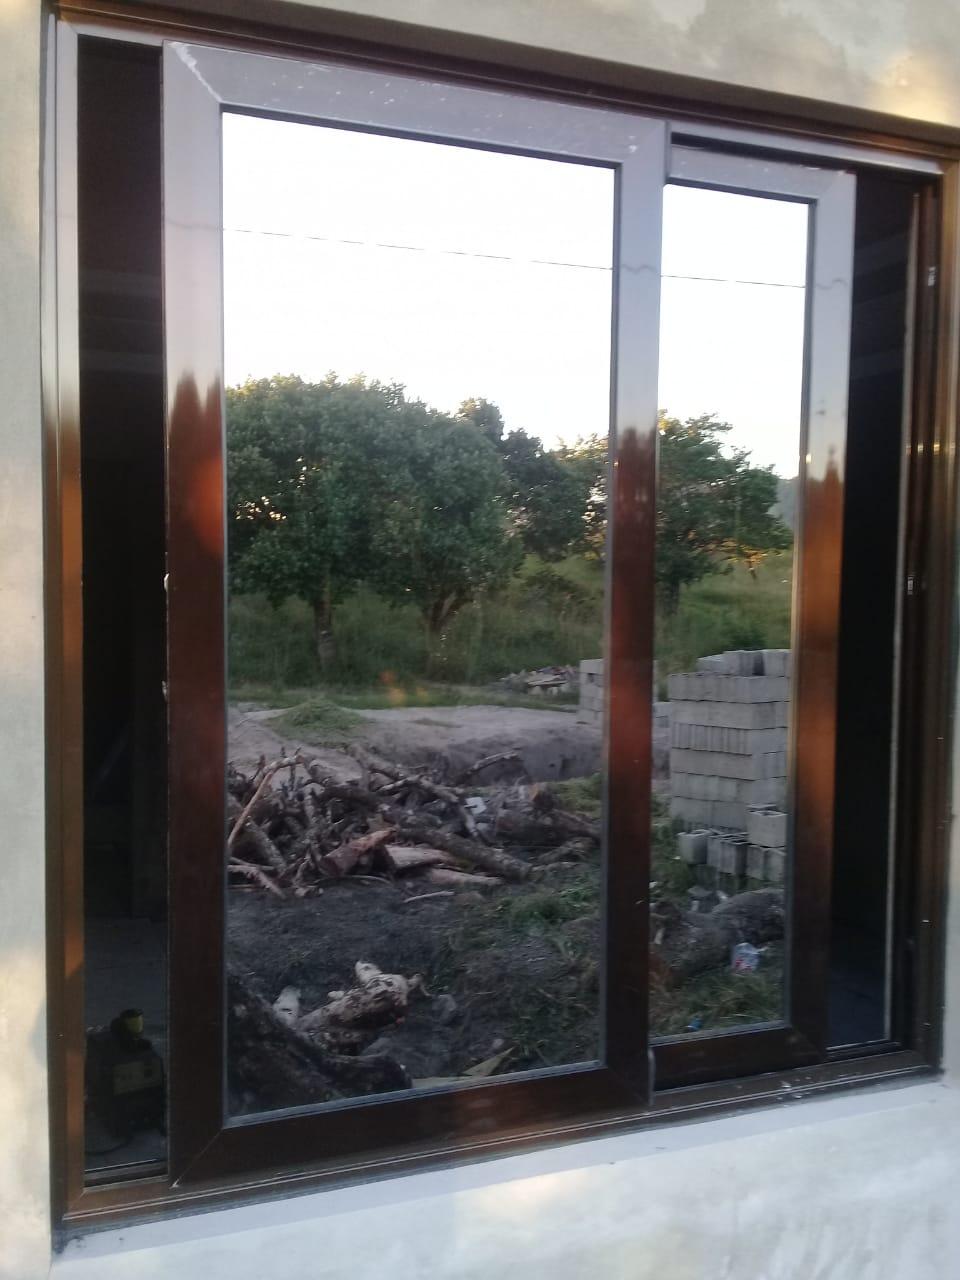 Sliding windows and mosquito nets